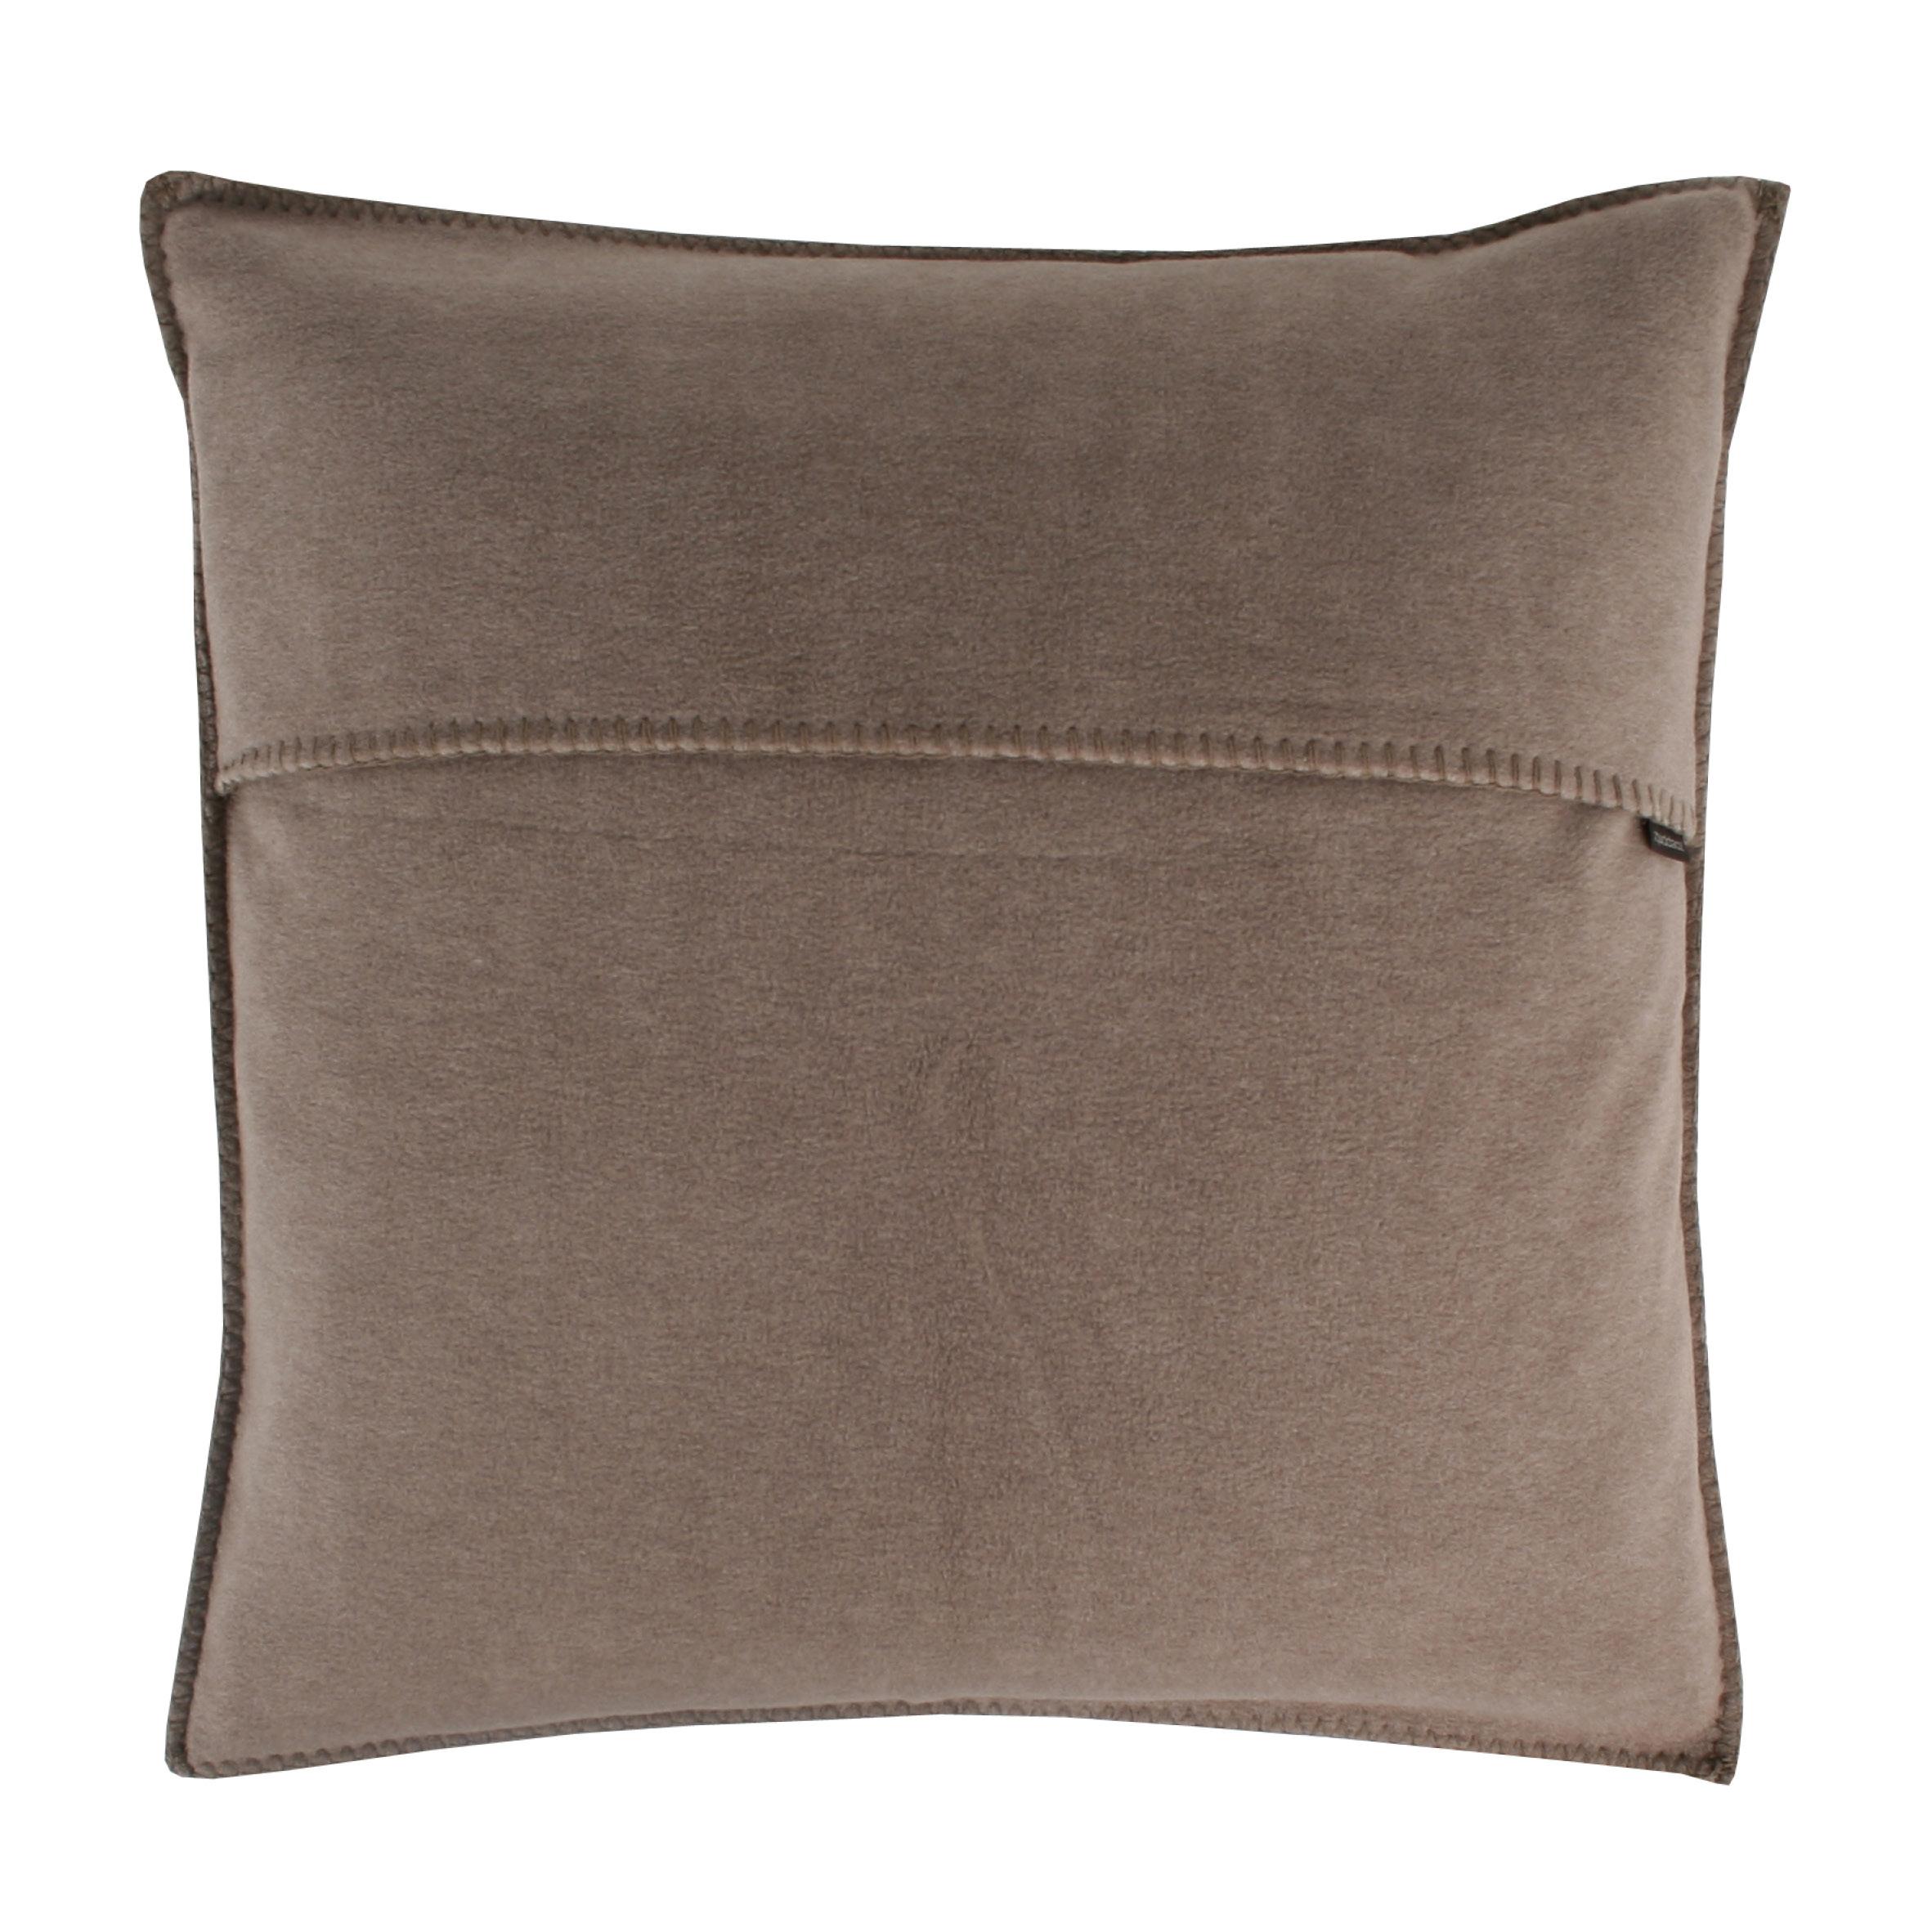 zoeppritz soft fleece kissen 40x40 braun 2 er set. Black Bedroom Furniture Sets. Home Design Ideas